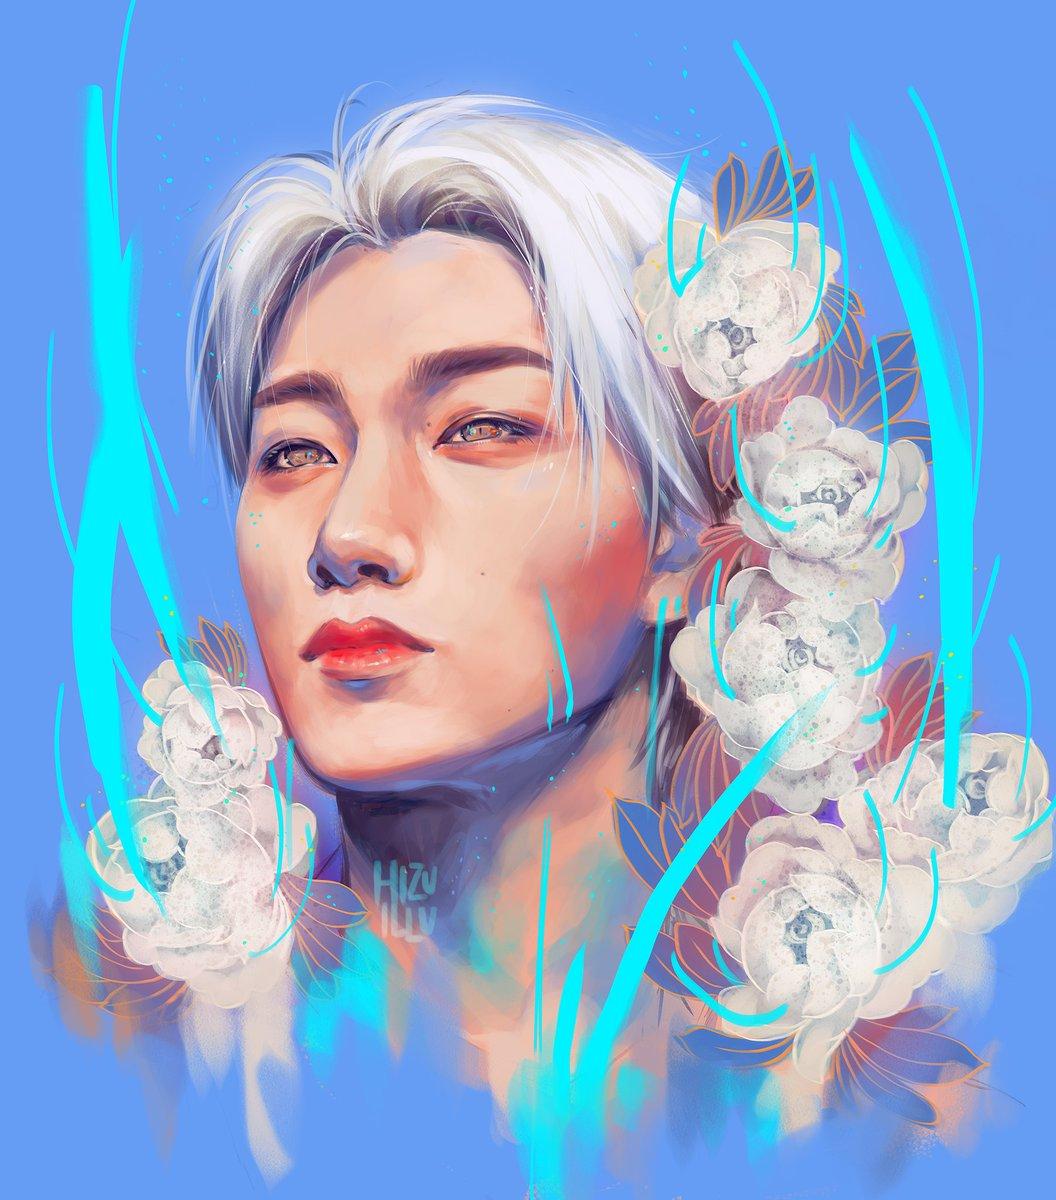 Flowery Choi San! I hate painting flowers with a passion  #ATEEZ #ATEEZFanArt #kpop  #kpopfanart #art #painting #choisan #illustration #flowers<br>http://pic.twitter.com/aqFYerhRU6